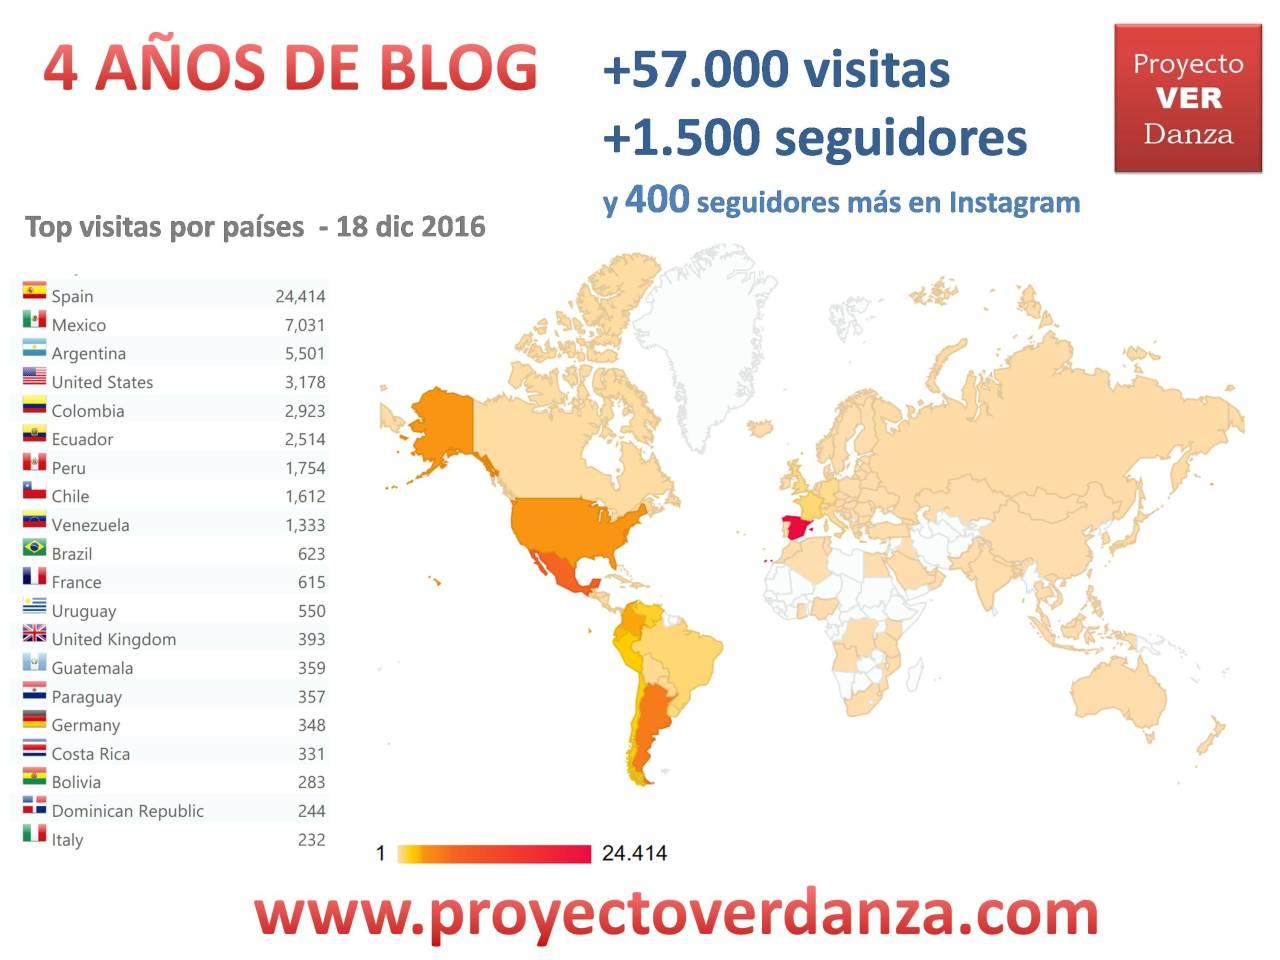 4o-aniversario-blog-proyecto-ver-danza-con-seguidores-instagram